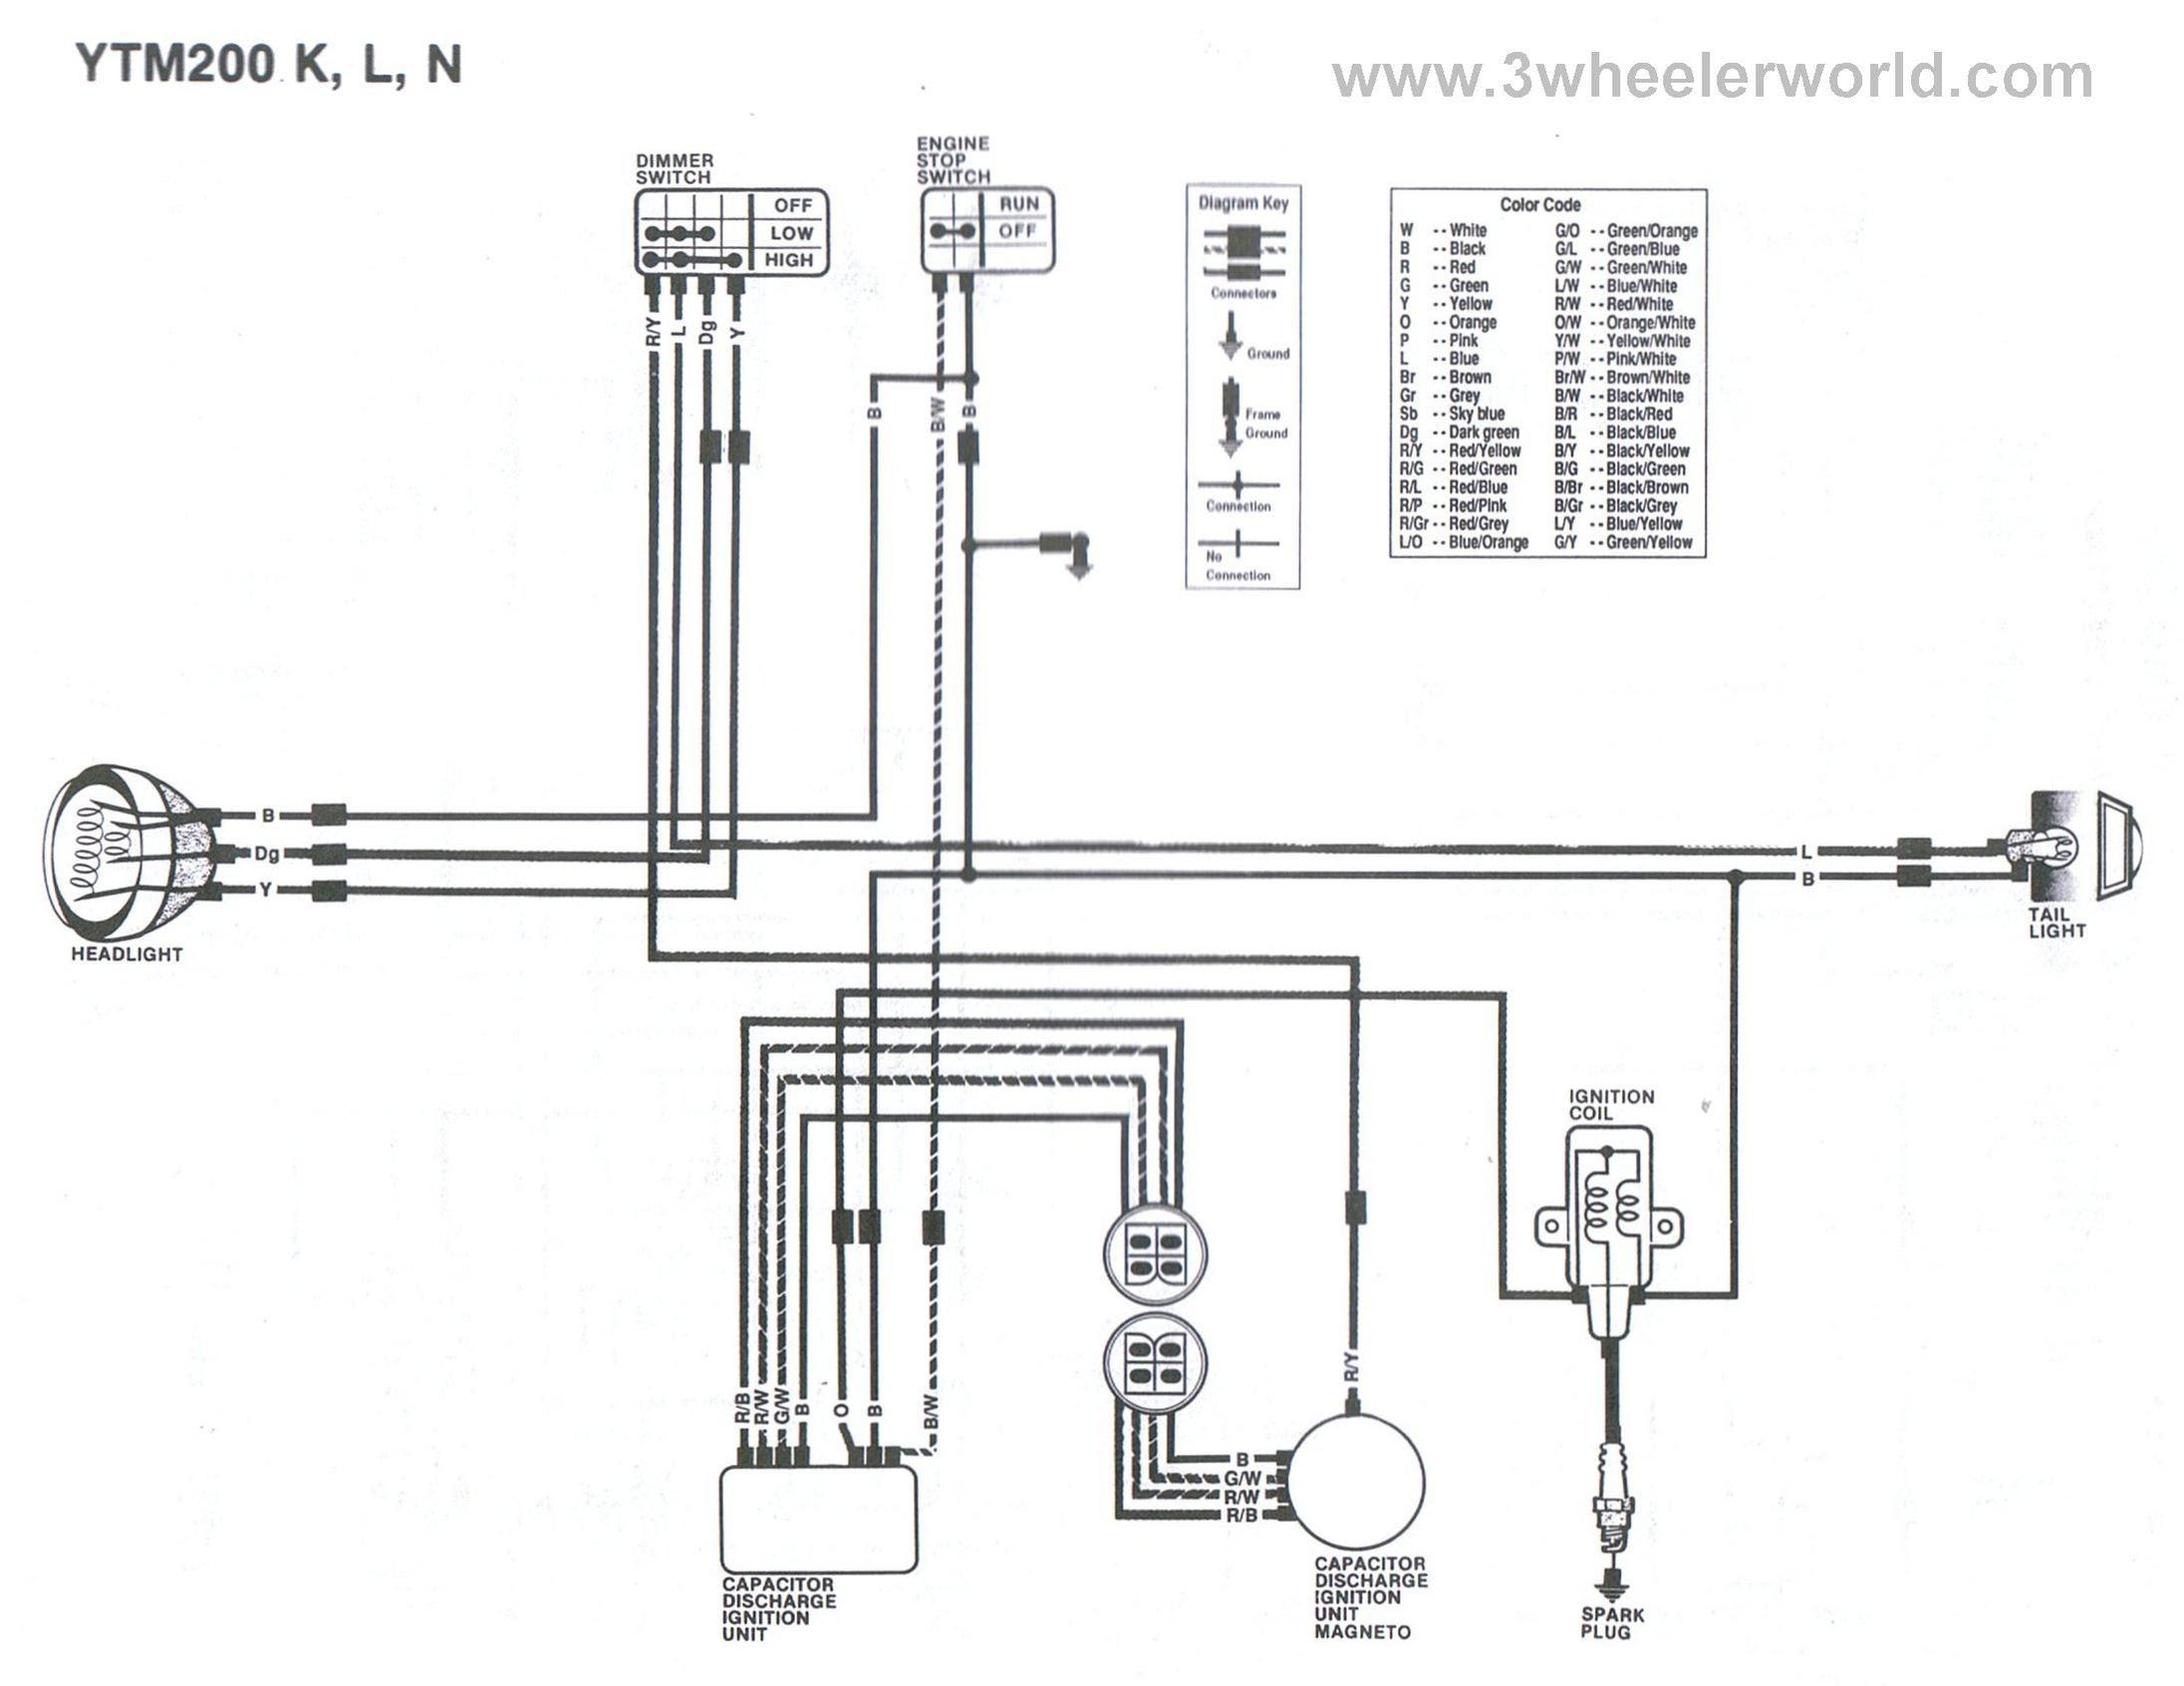 3wheeler World Yamaha Ytm200 K N L Tri Moto Wiring Diagram